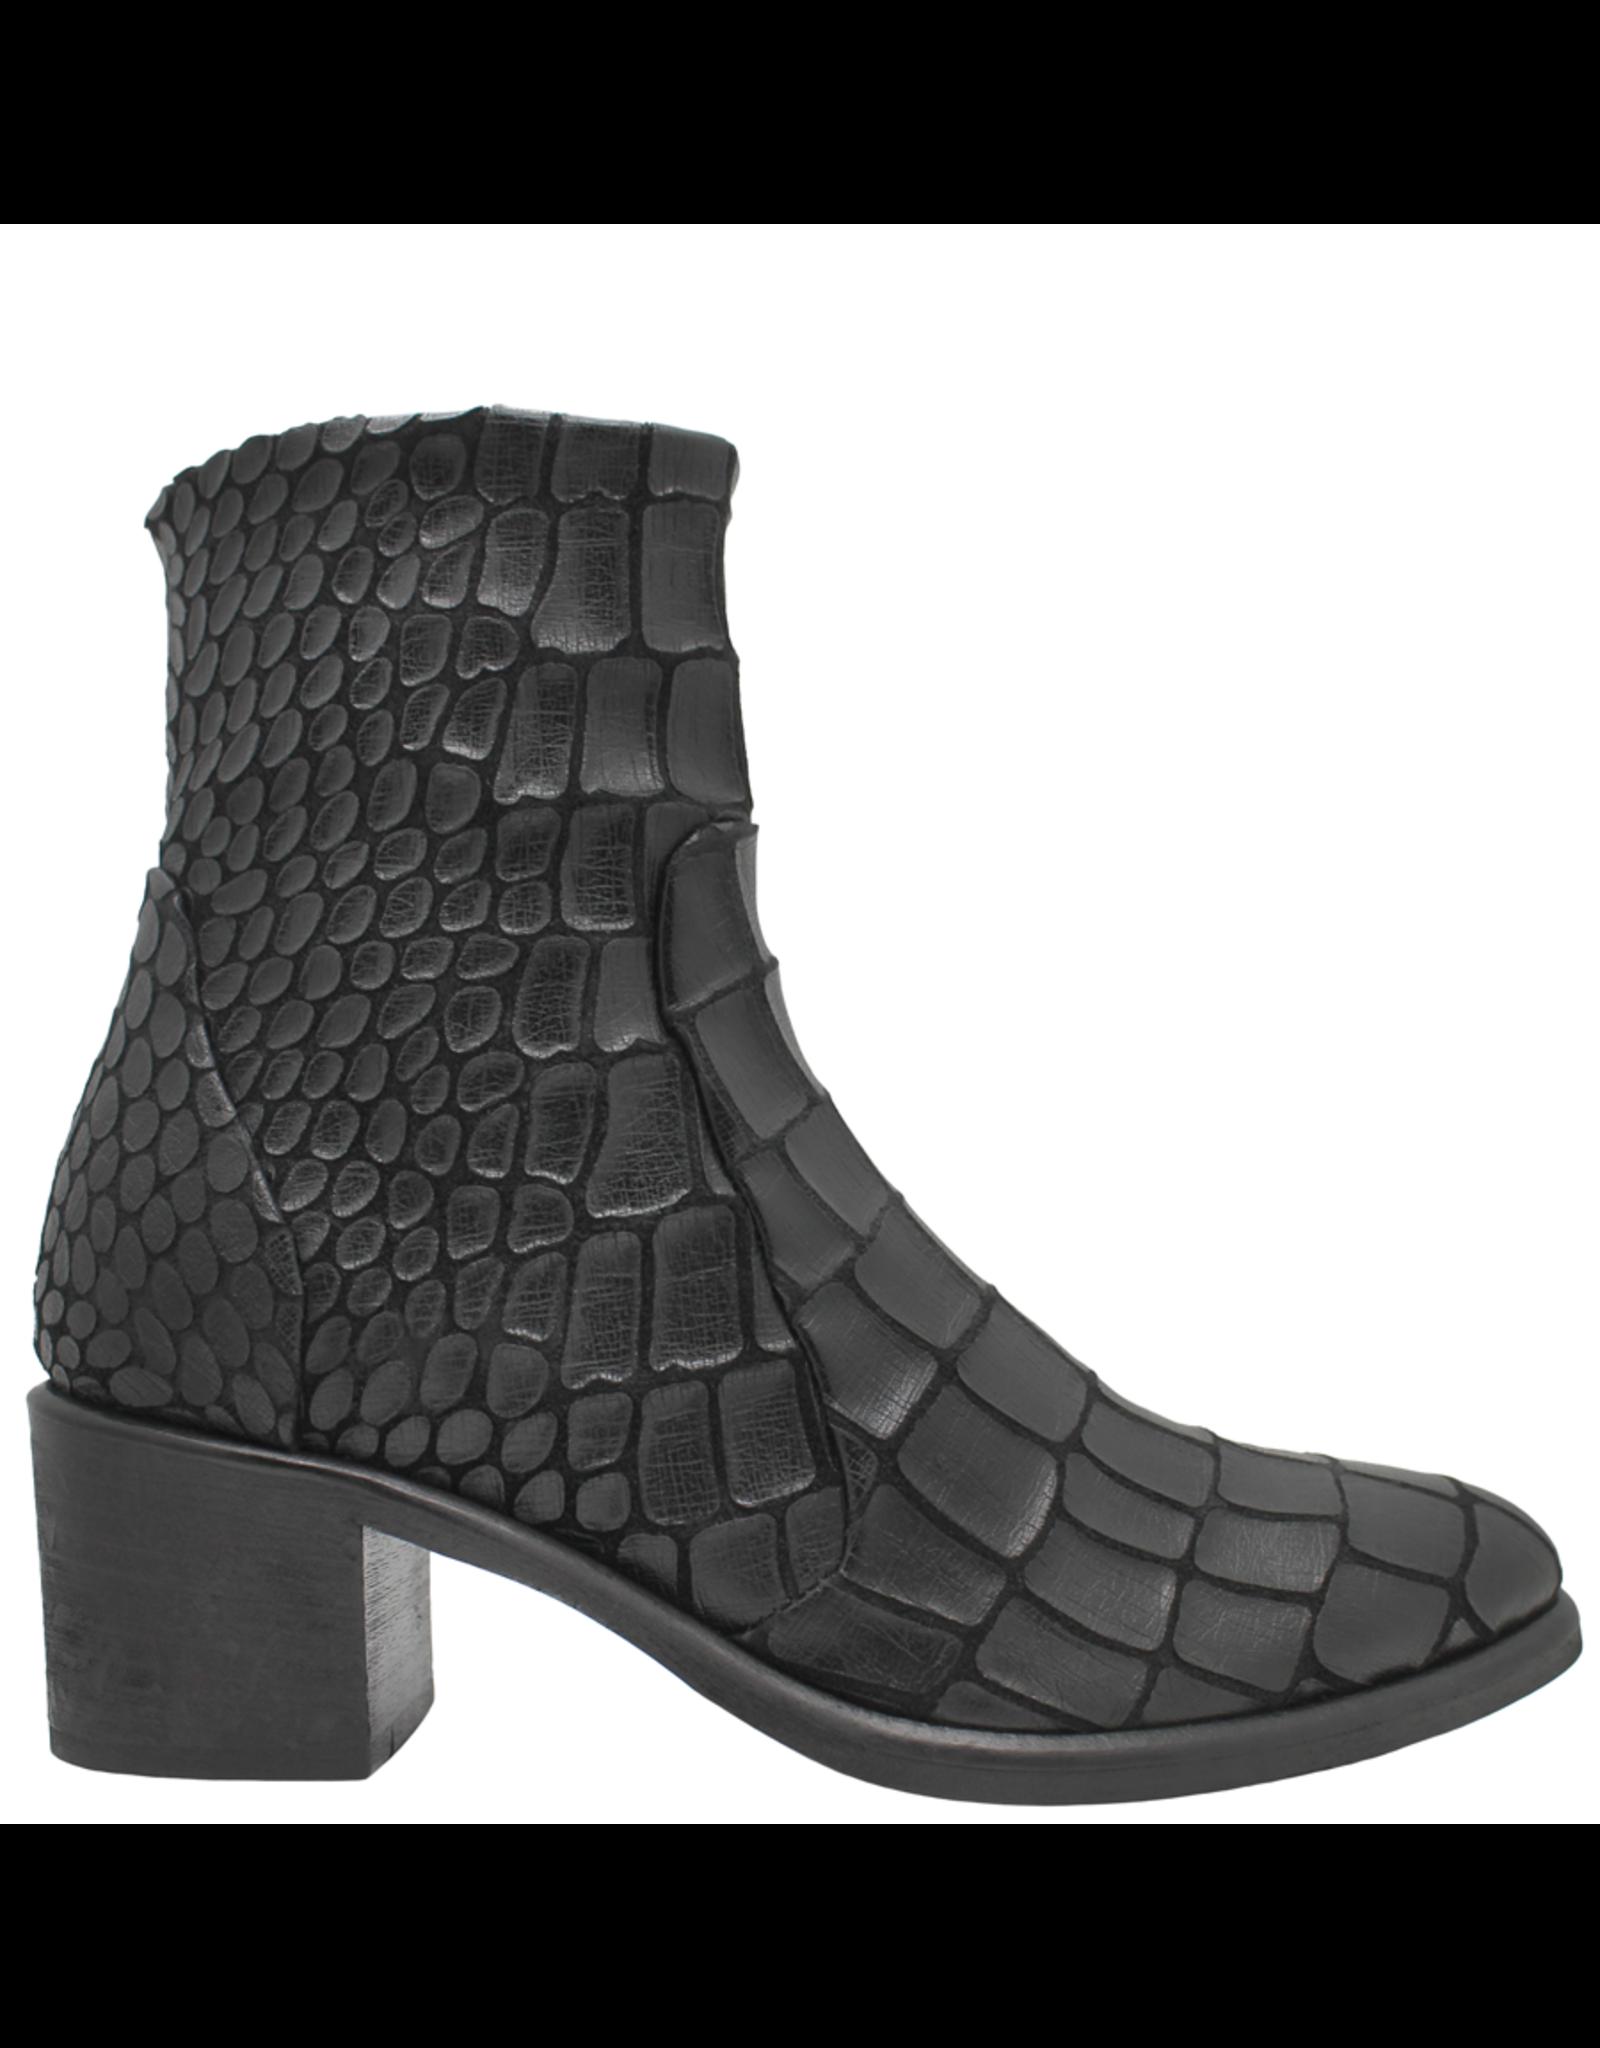 Strategia Strategia Black Gator Side Zip Boot 3913